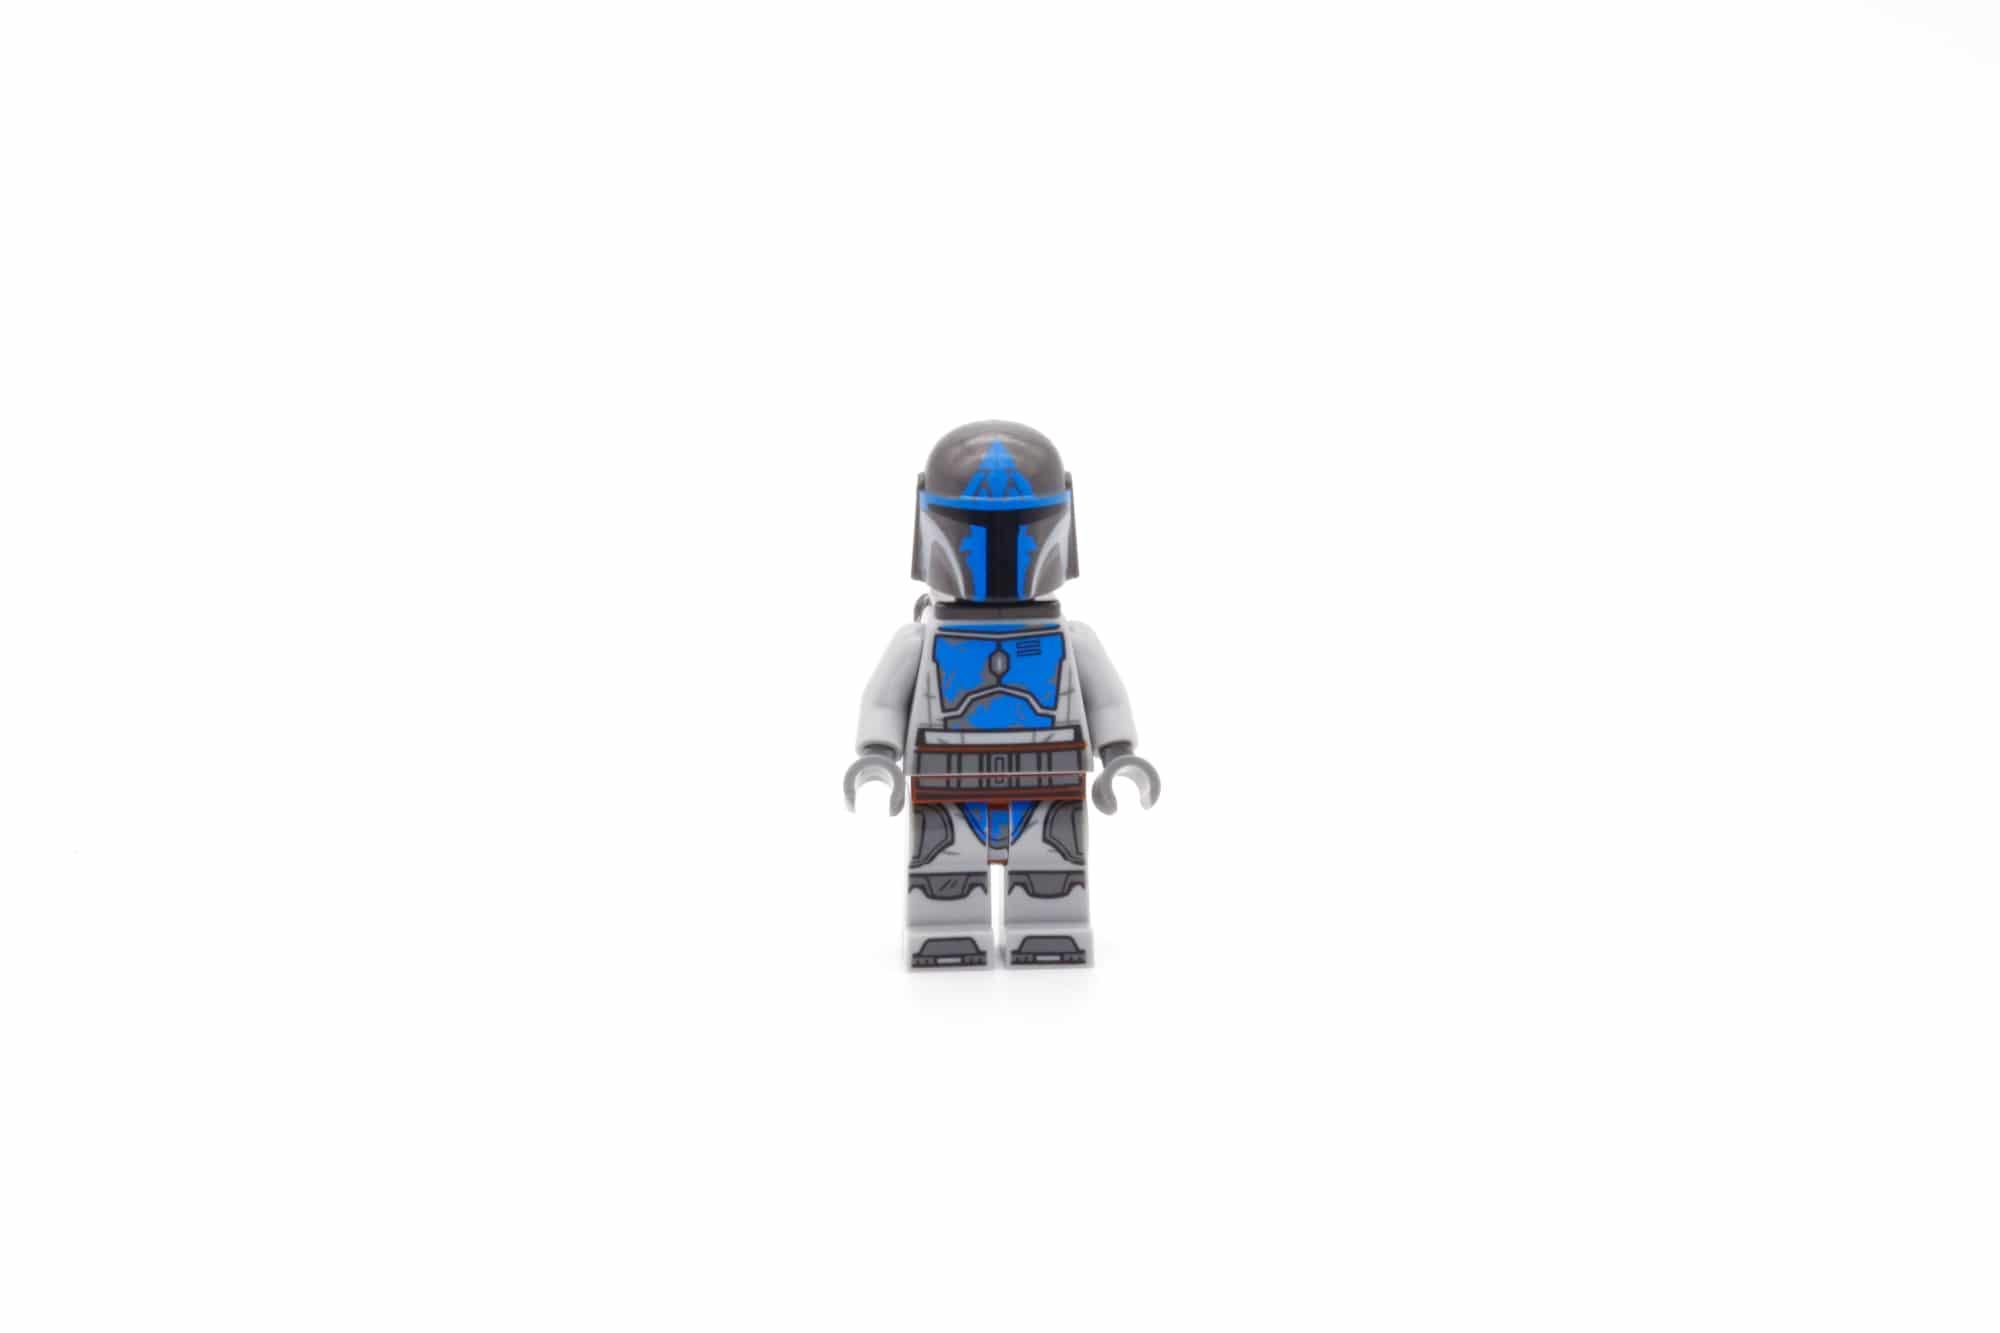 LEGO Star Wars 75316 Mandalorian Starfighter 11